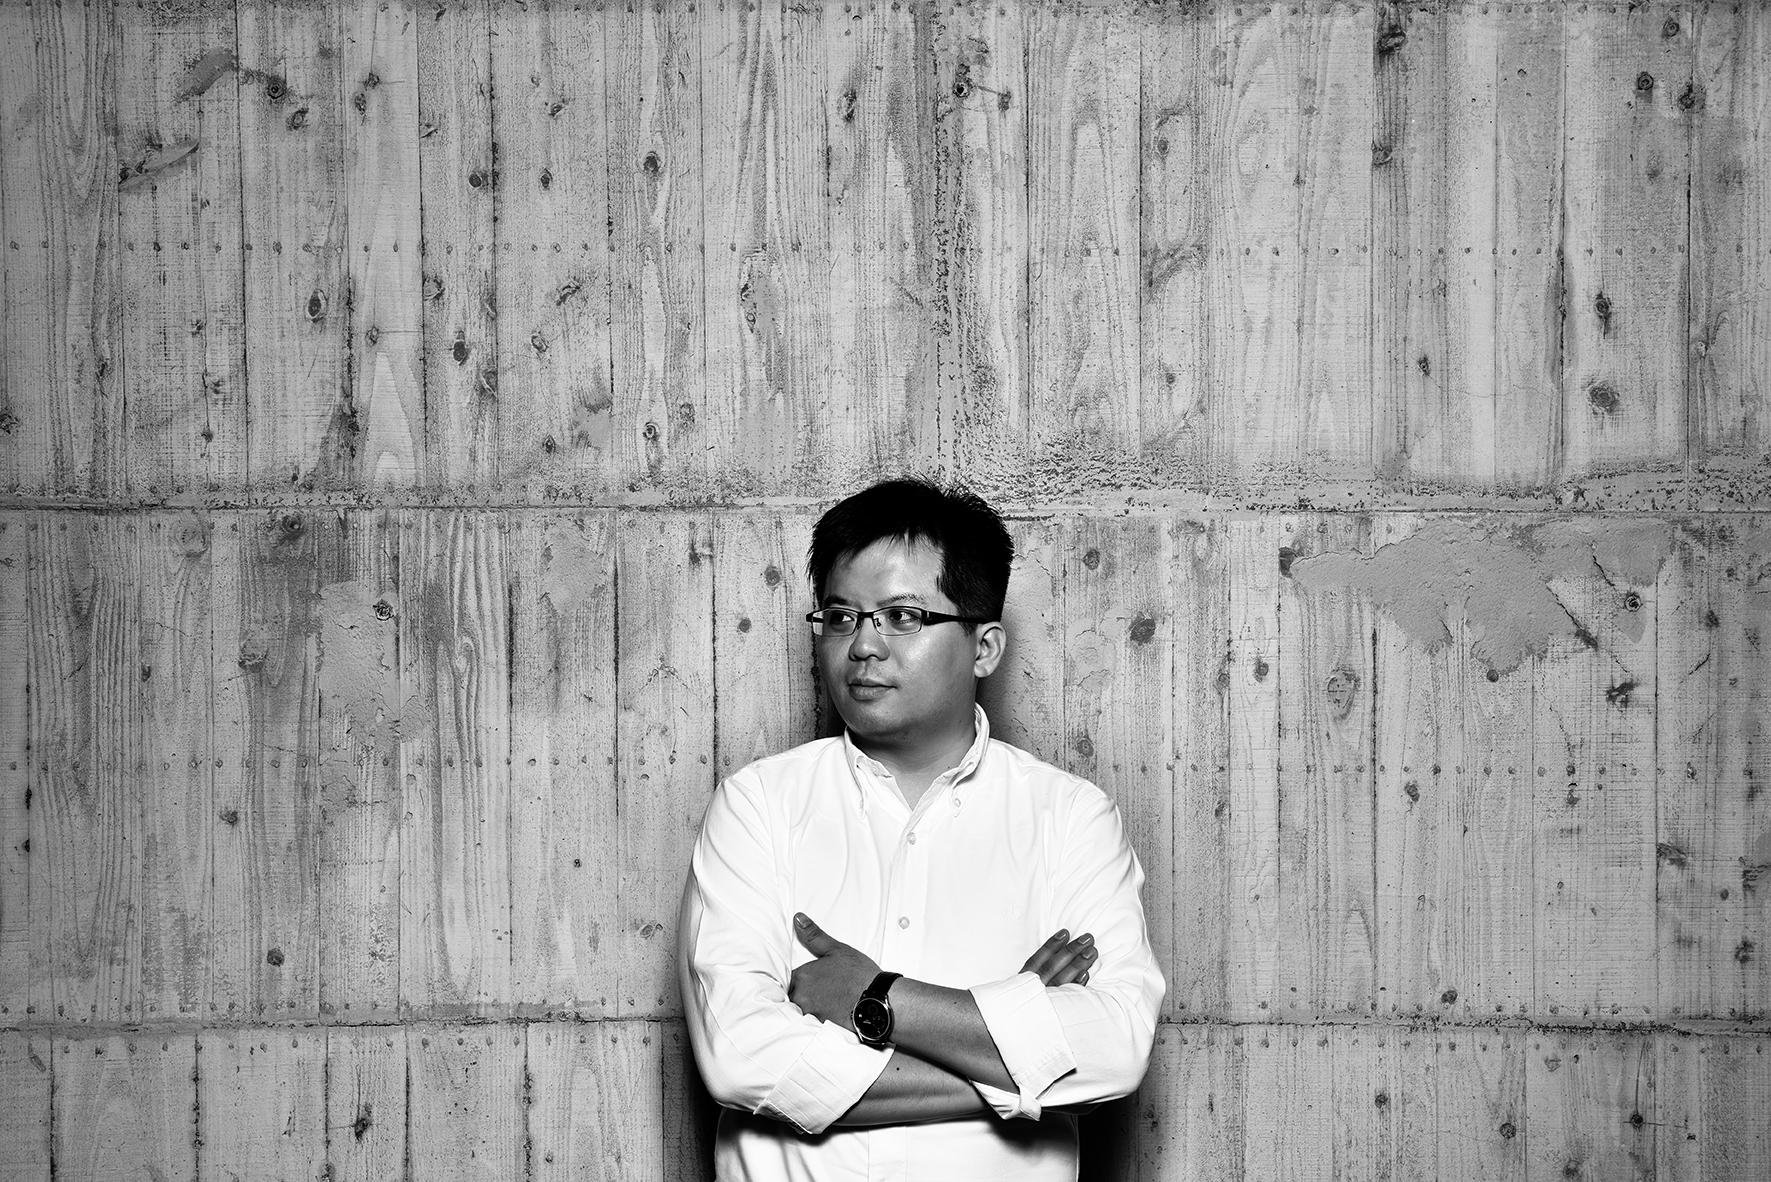 朱芳毅 Fang-Yi Chu / 陶藝家 Ceramist  國立台南藝術大學材質創作與設計系 / 專任講師 Lecturer of Material Arts & Design, Tainan National University of the Arts